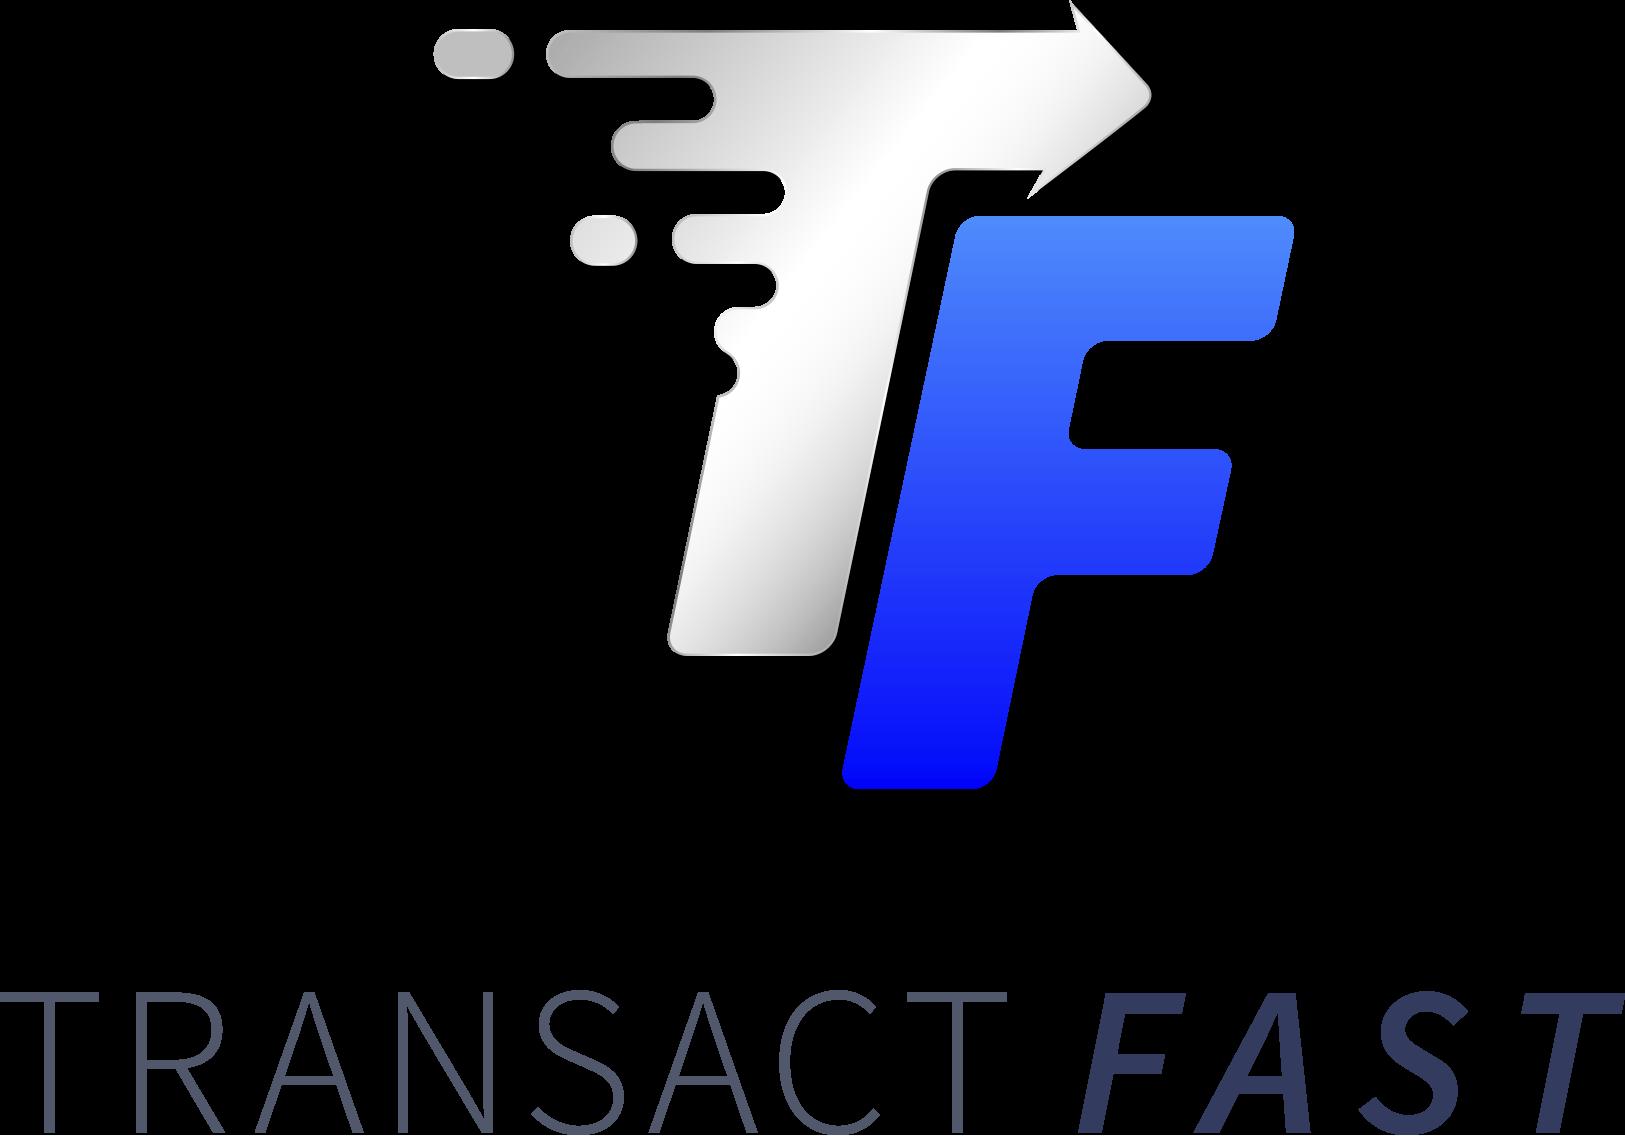 TransActFast